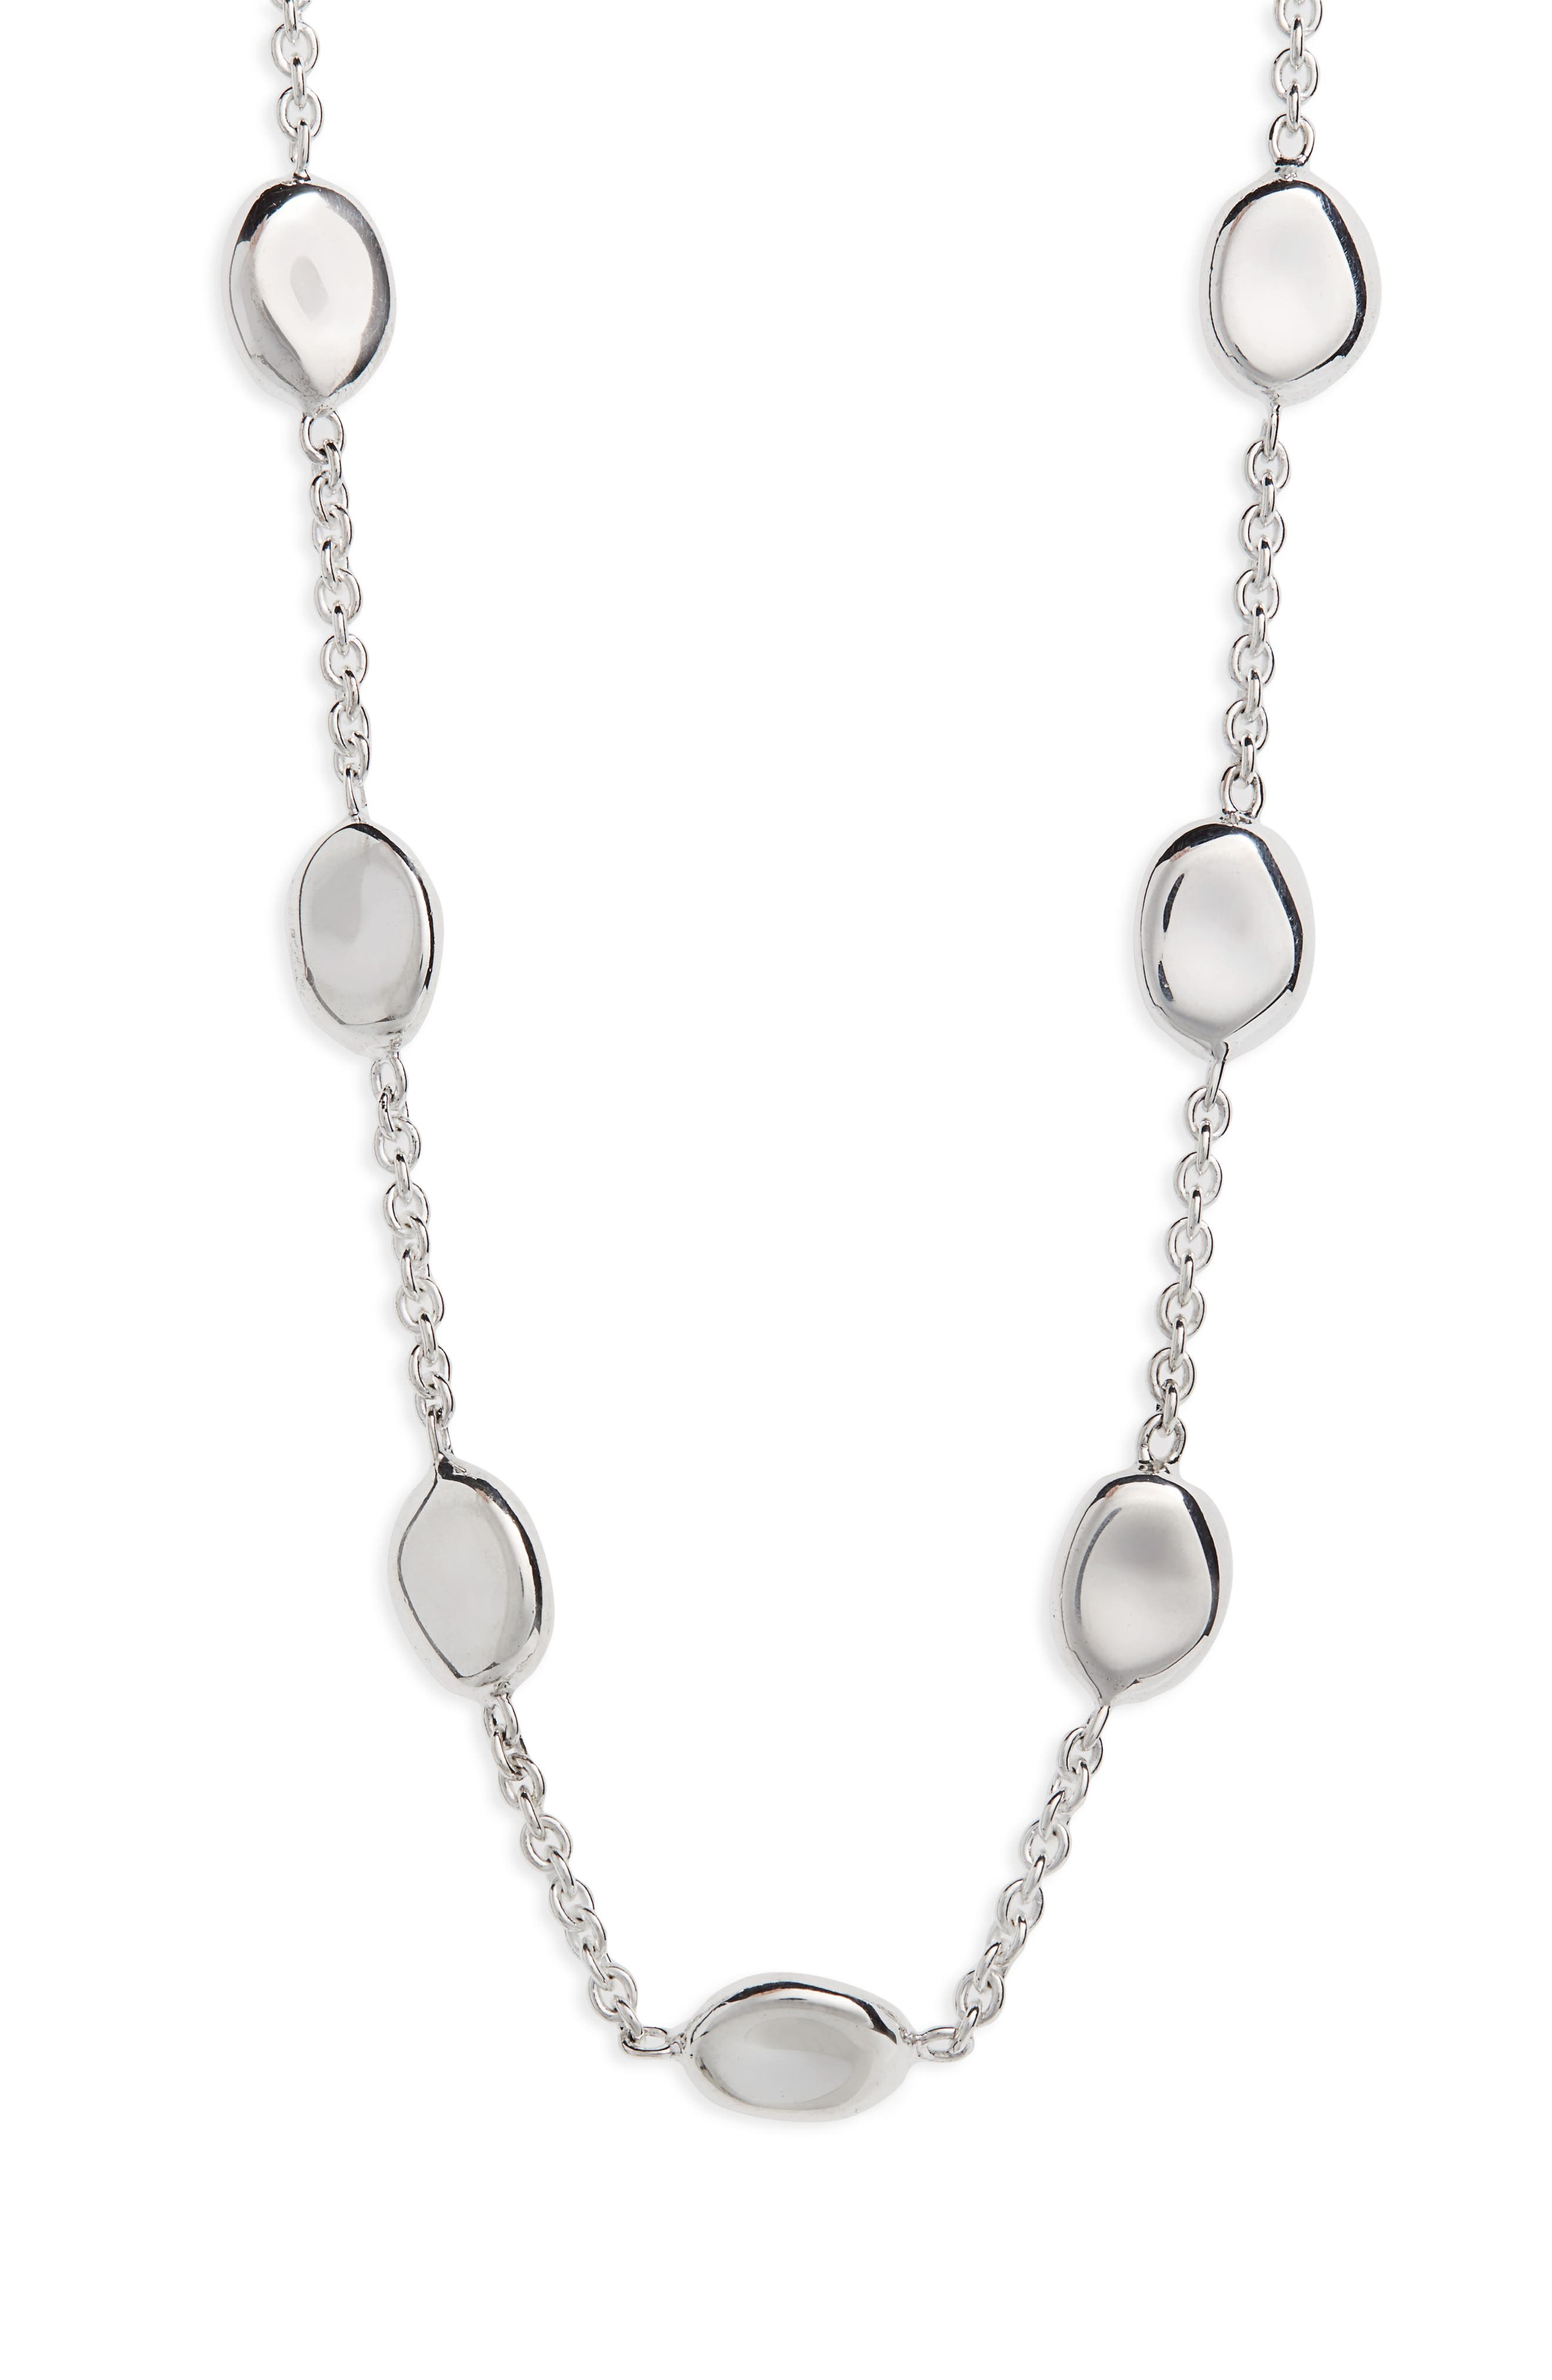 Alternate Image 1 Selected - Ippolita Onda Chain Necklace